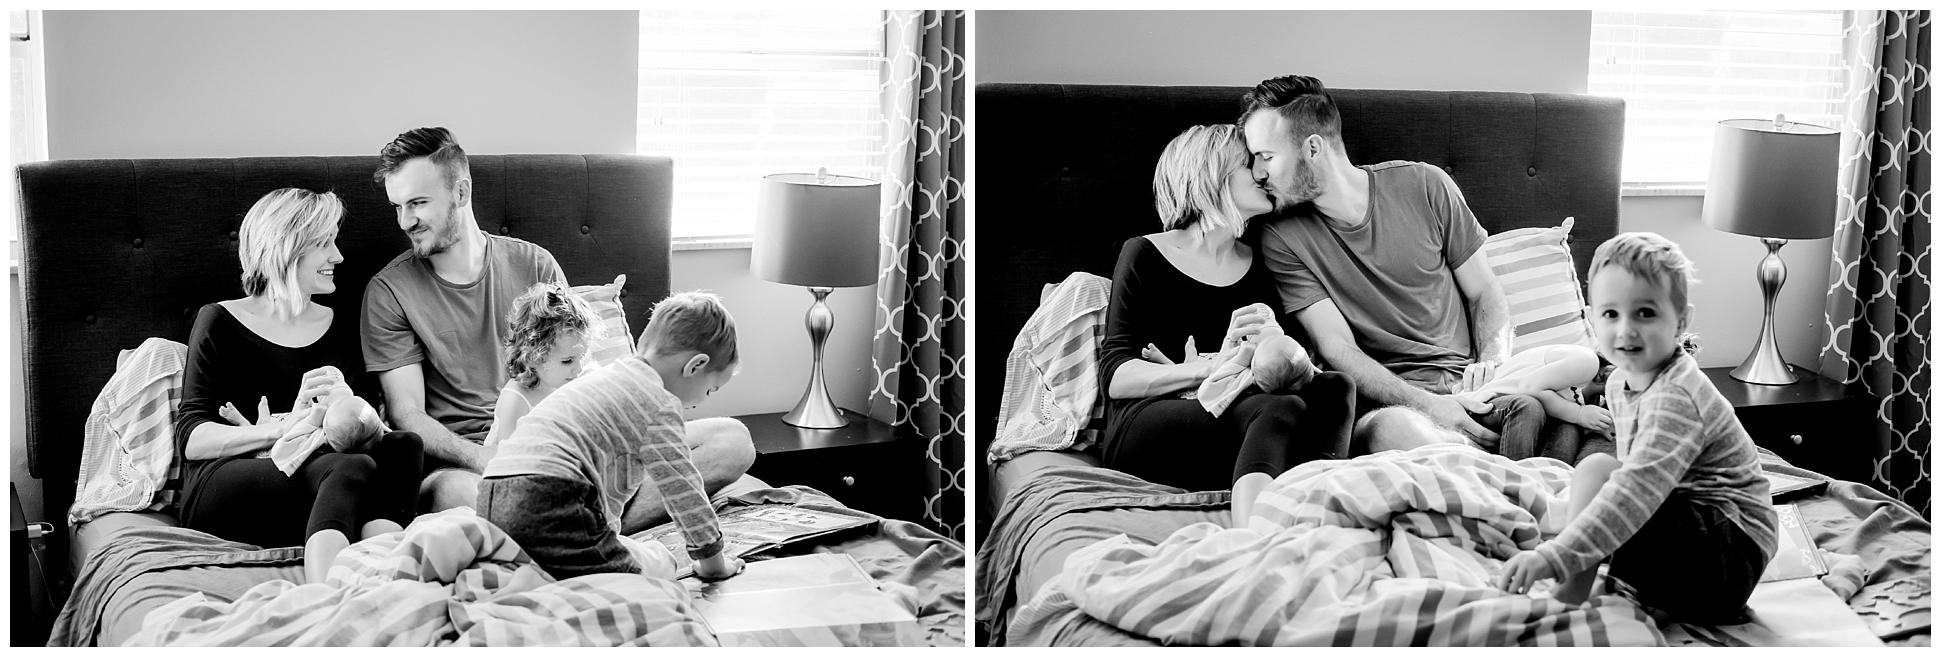 tampa-lifestyle-portrait-photographer-in-home-pentax-film-vs-digital_0020.jpg